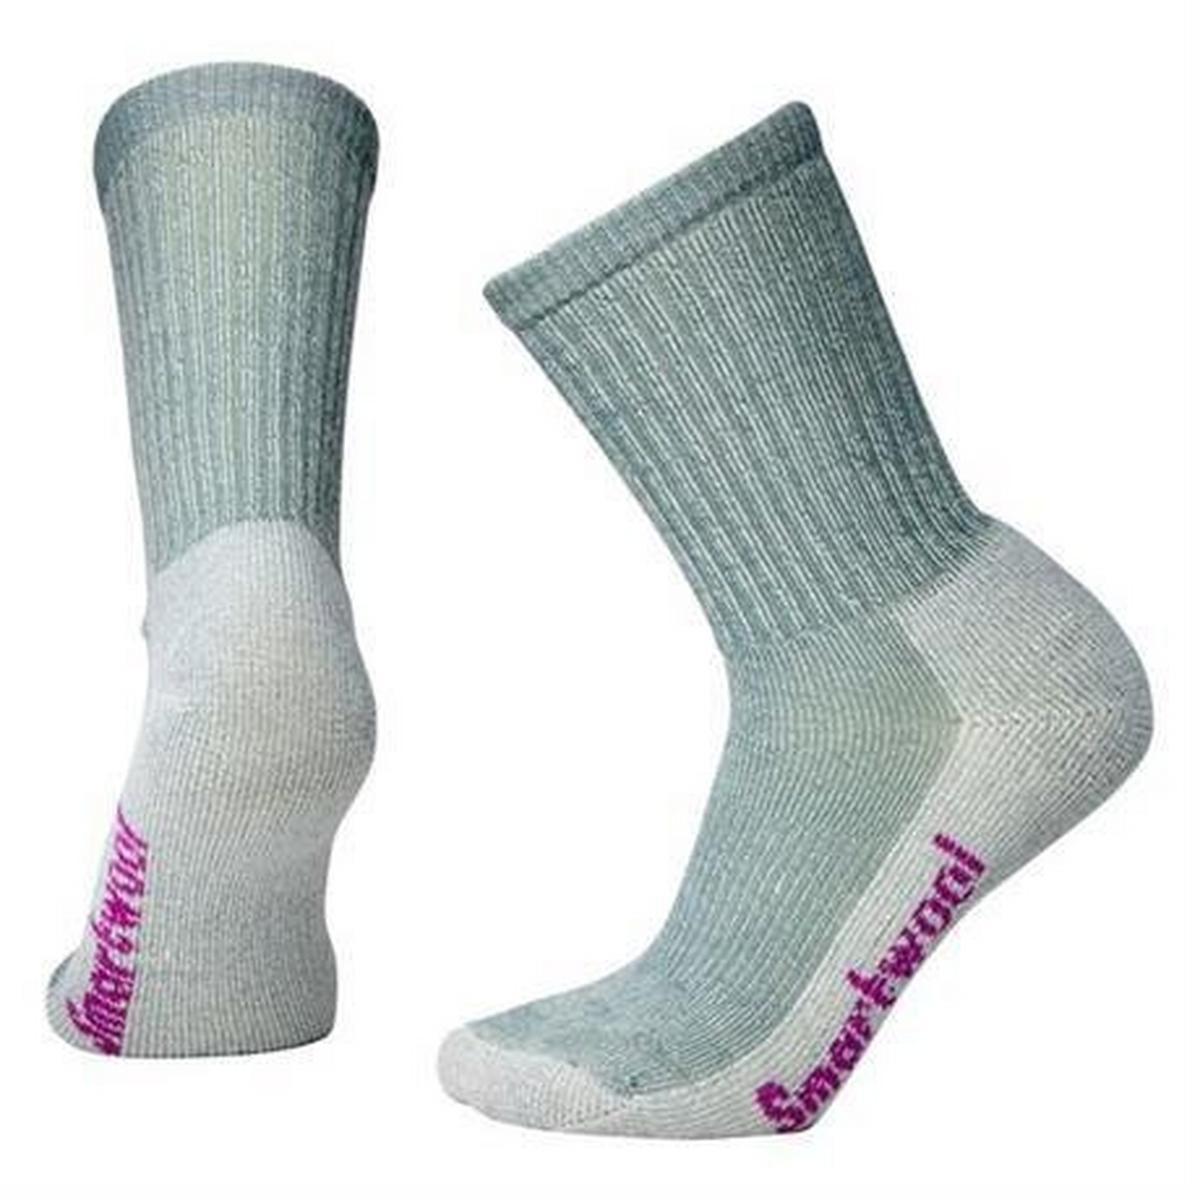 Smartwool HIKING Socks Women's Hike Light Crew Light Grey